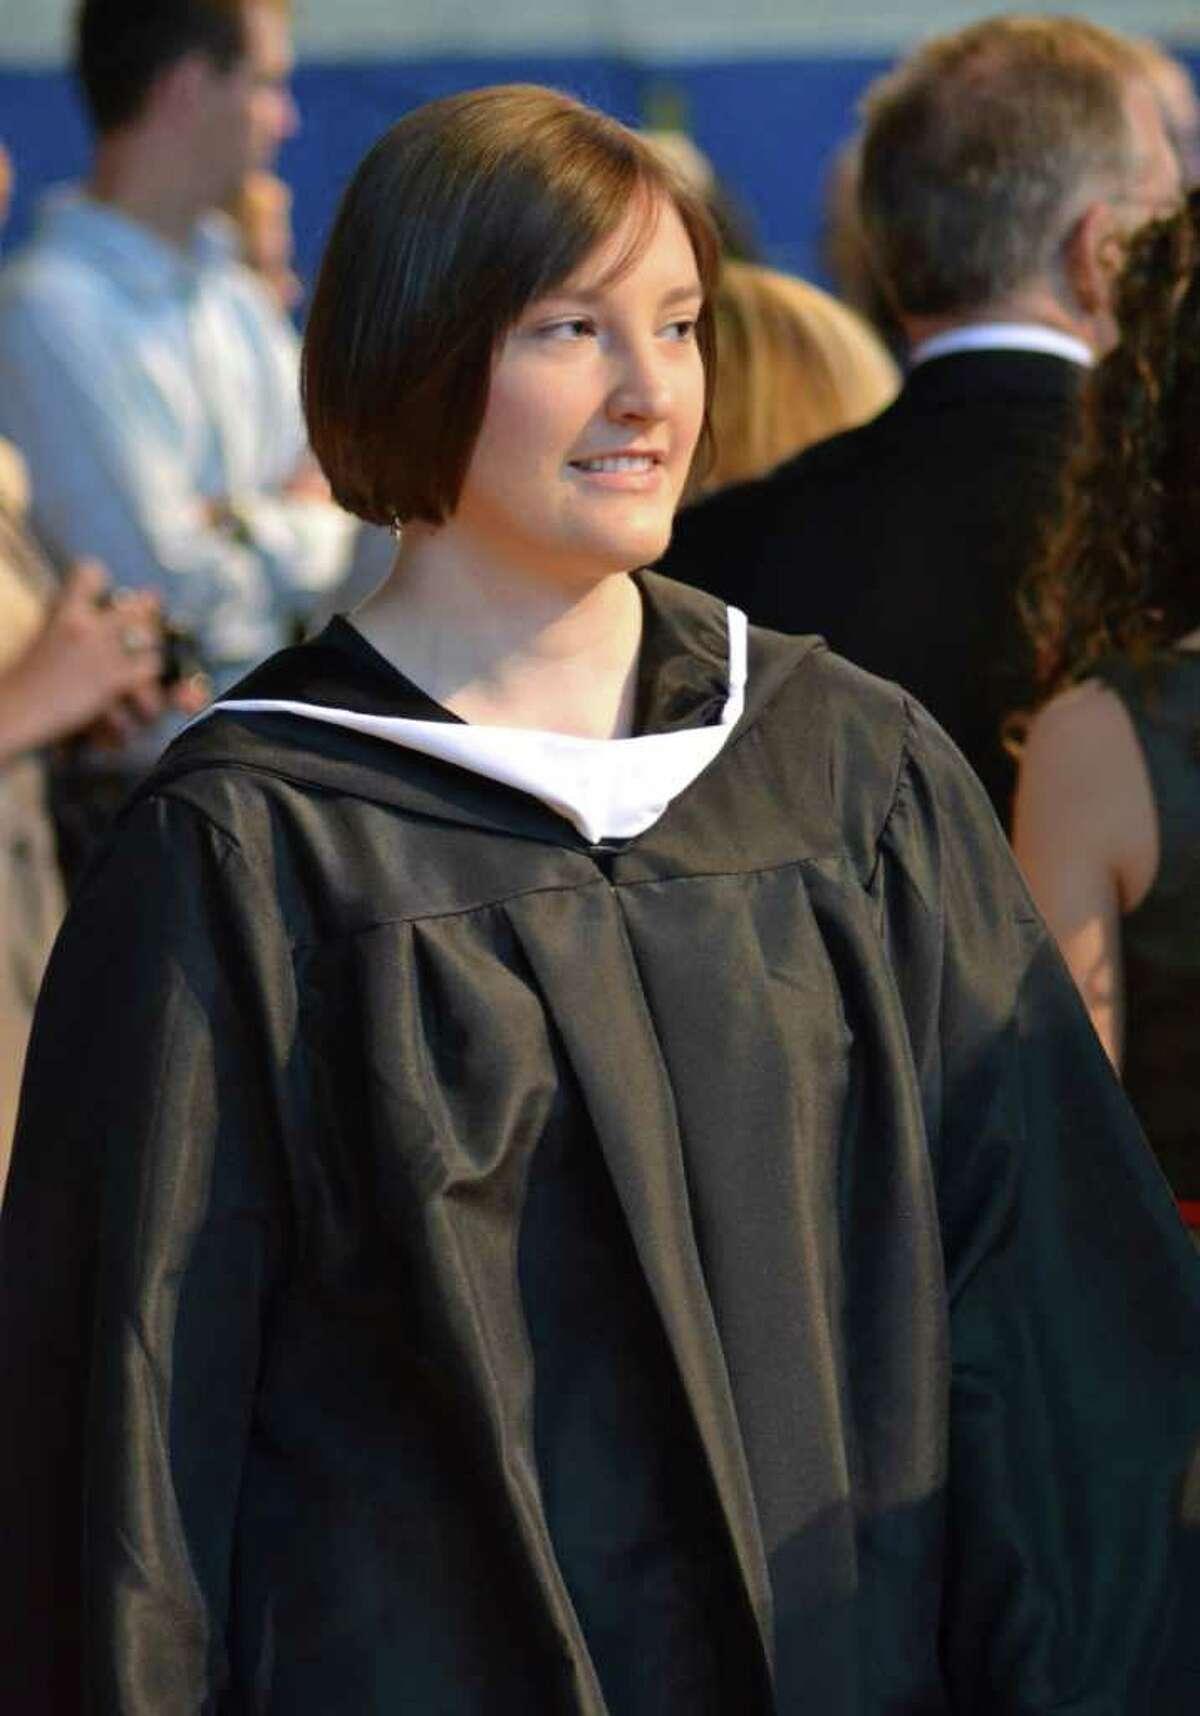 Christian Heritage Graduation in Trumbull, CT, 6/4/2011